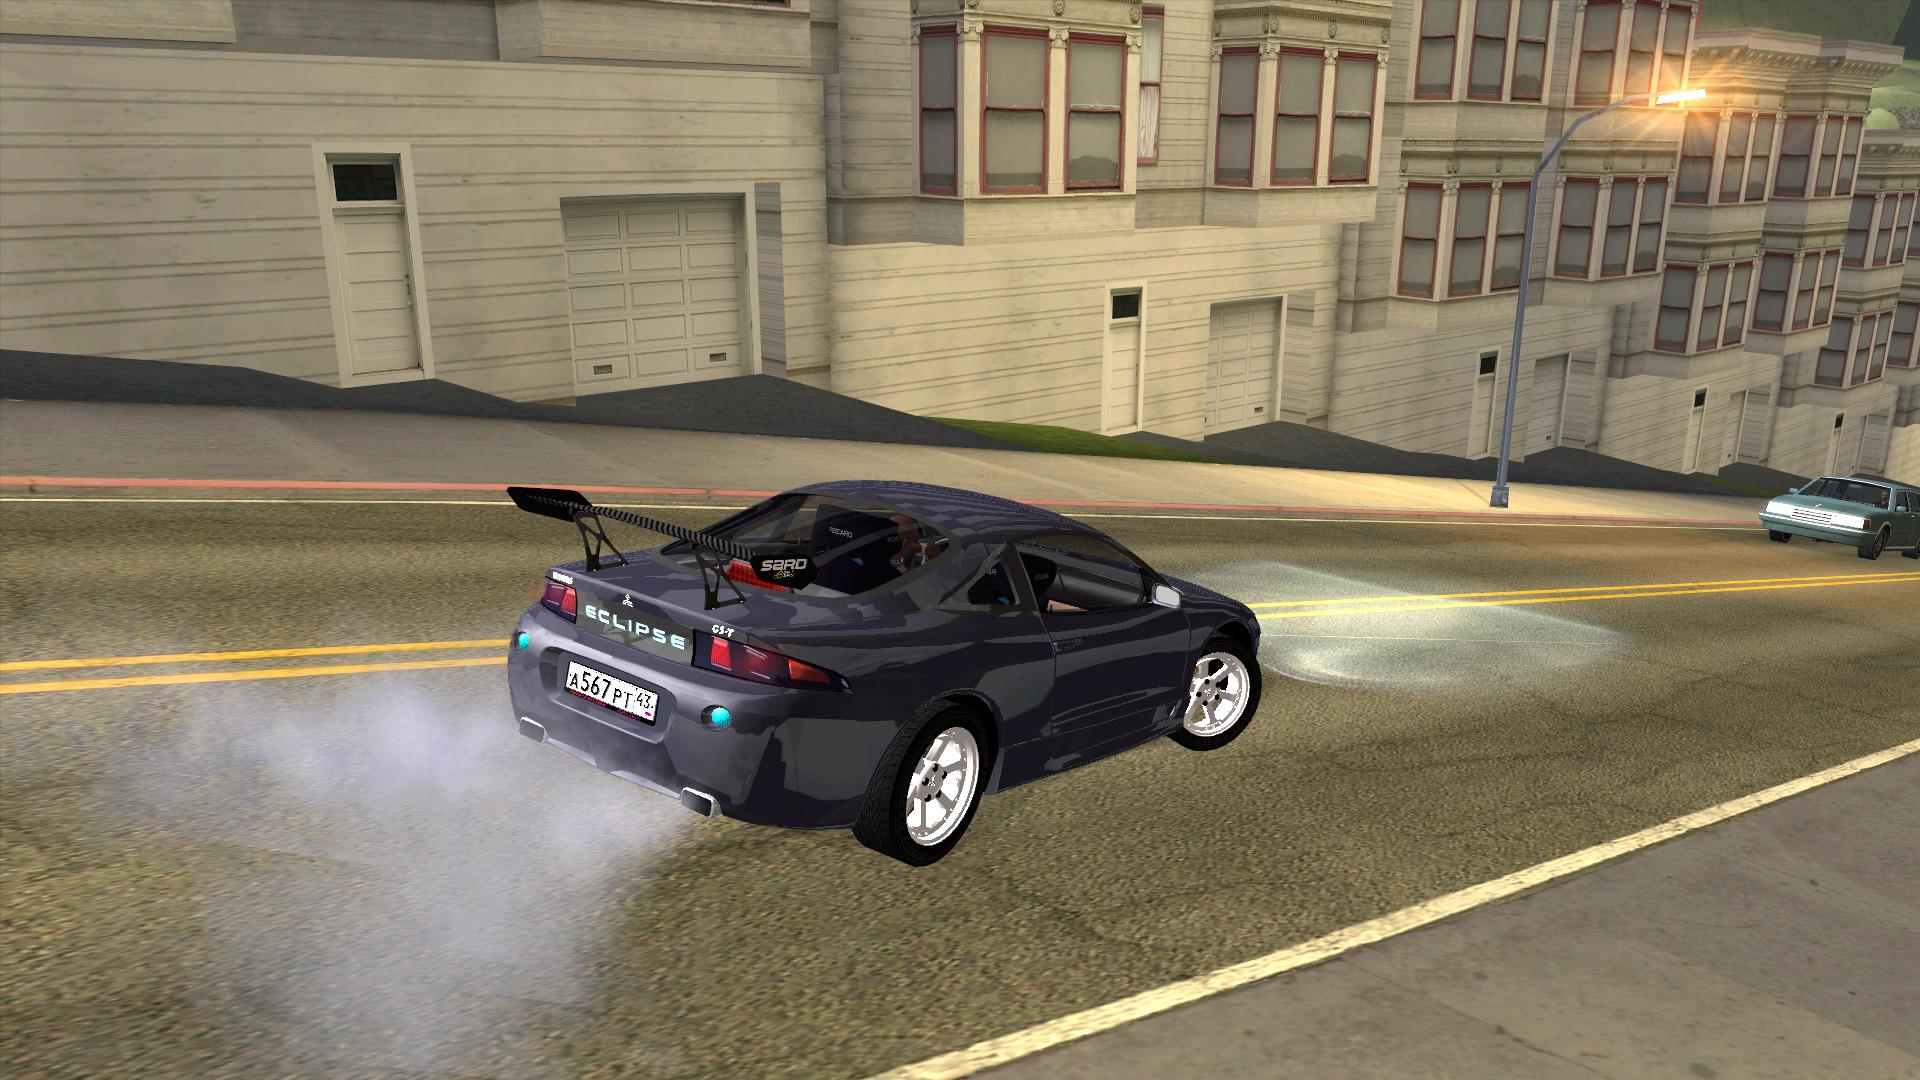 gta_sa 2016-05-14 11-57-44-46.jpg - Grand Theft Auto: San Andreas